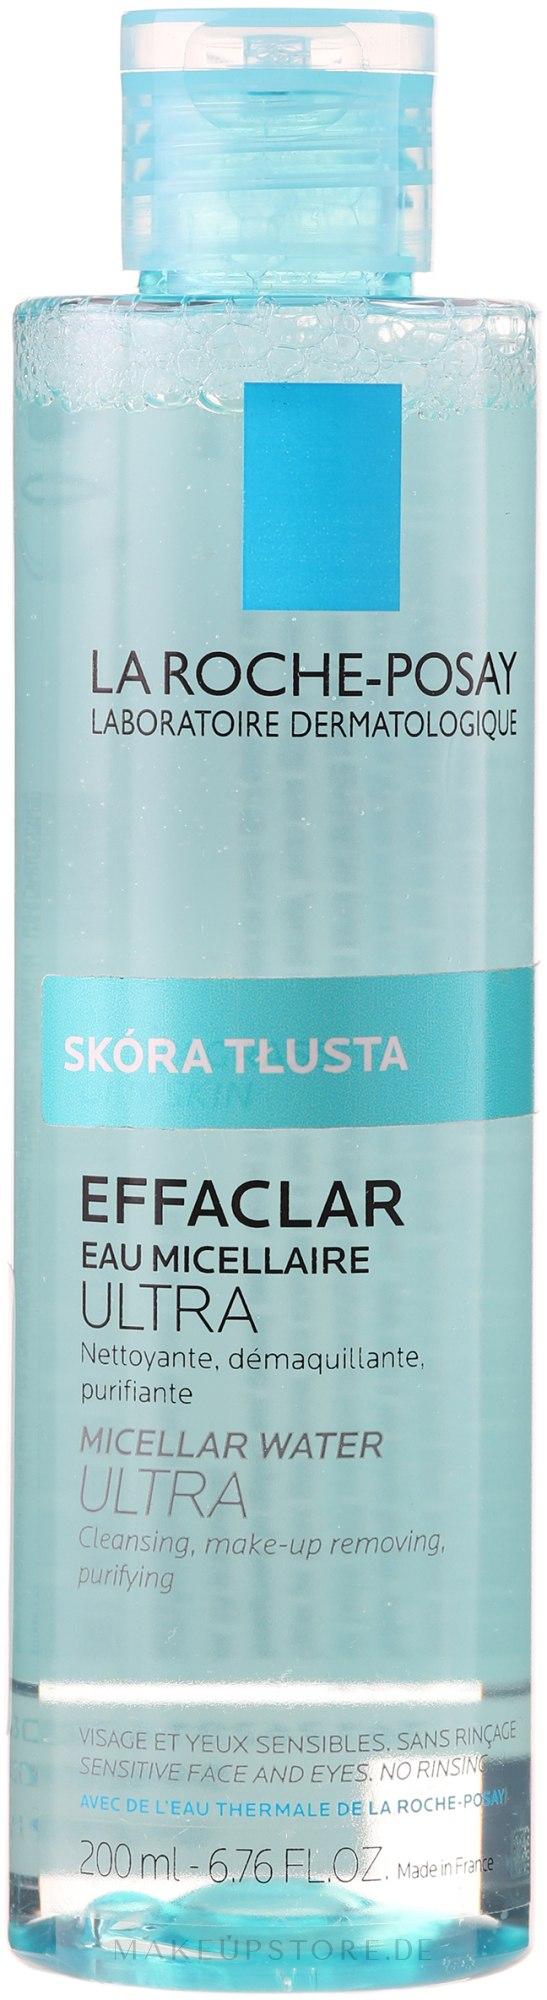 Make-up Reinigungslotion - La Roche-Posay Effaclar Make-Up Removing Purifying Water — Bild 400 ml